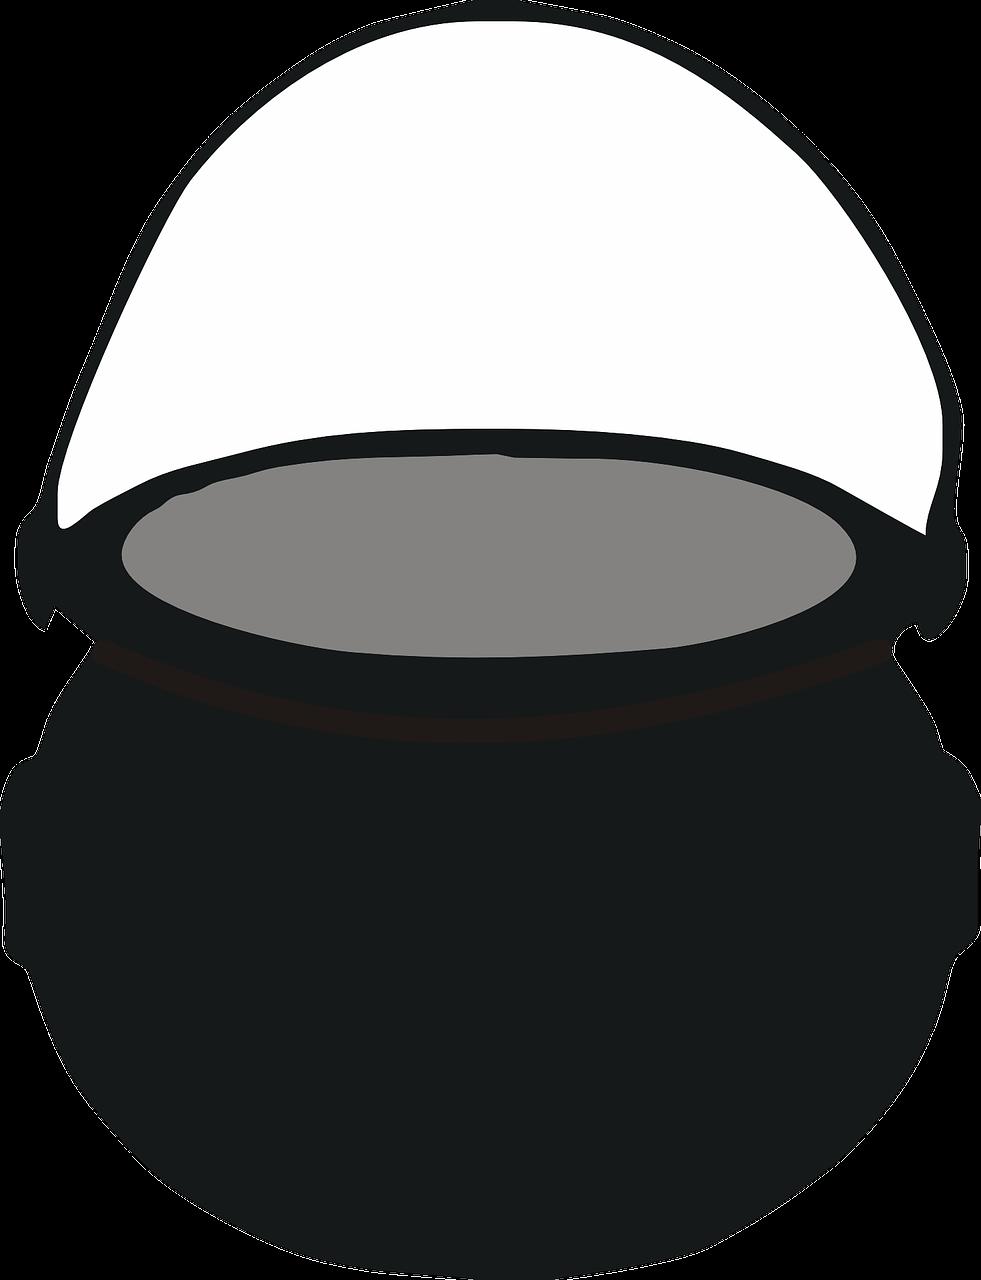 Clipart image of a cauldron